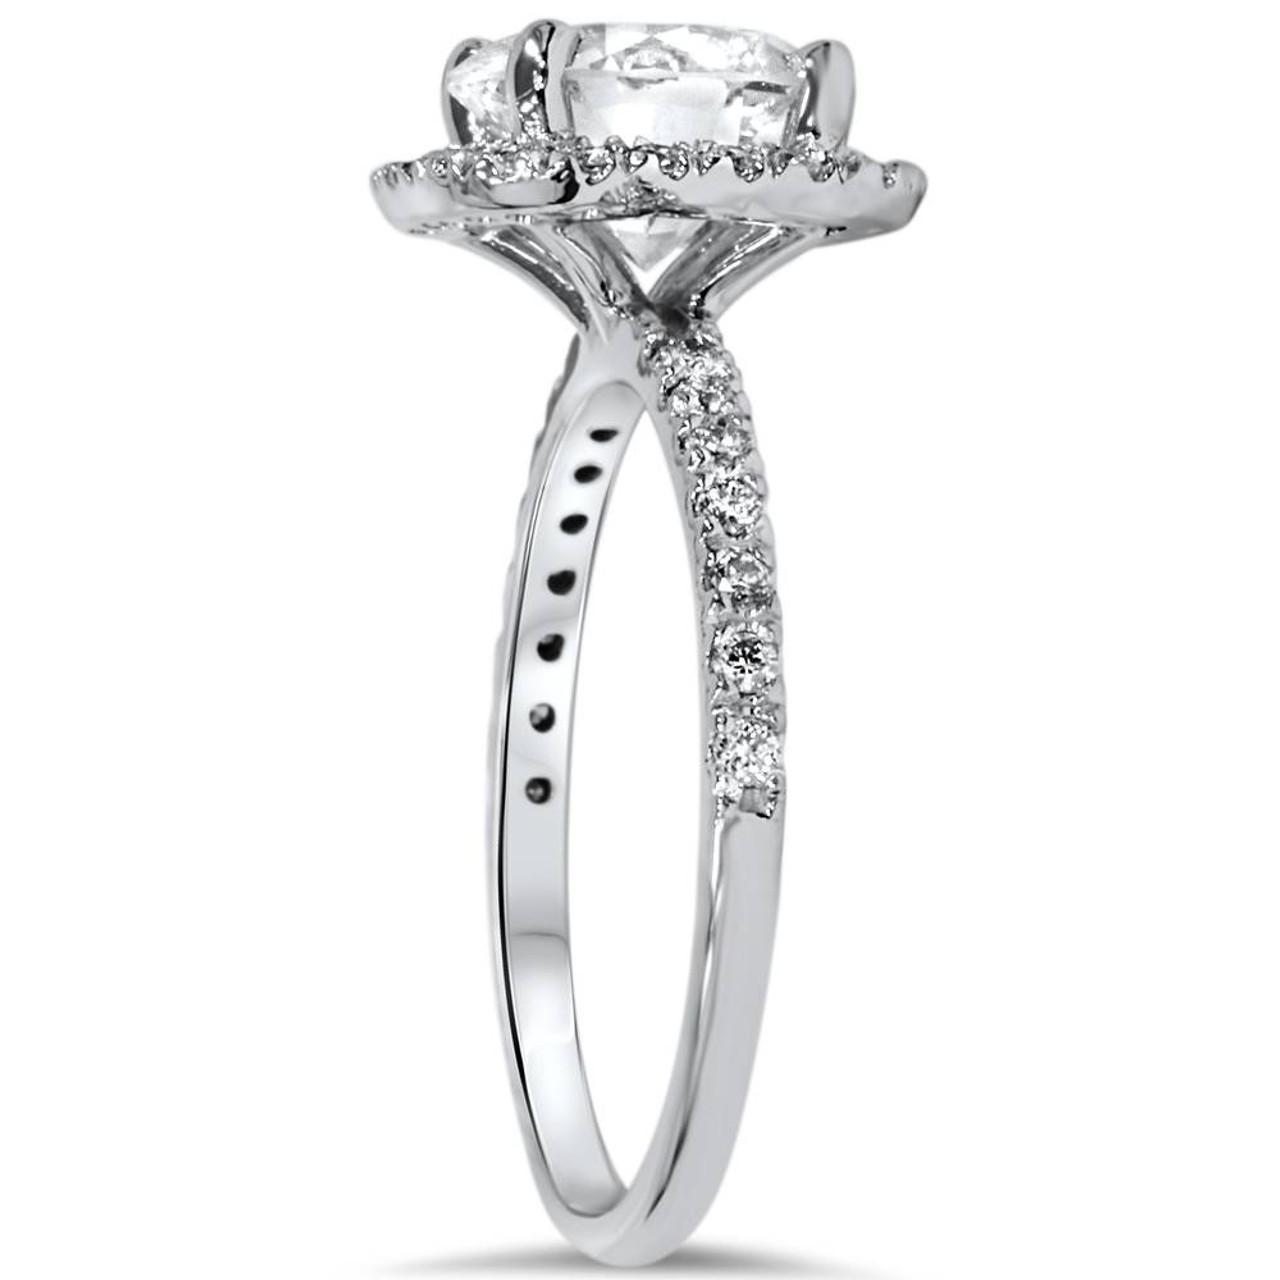 1 34 CT Halo Diamond Engagement Ring Round Cut 14K White Gold